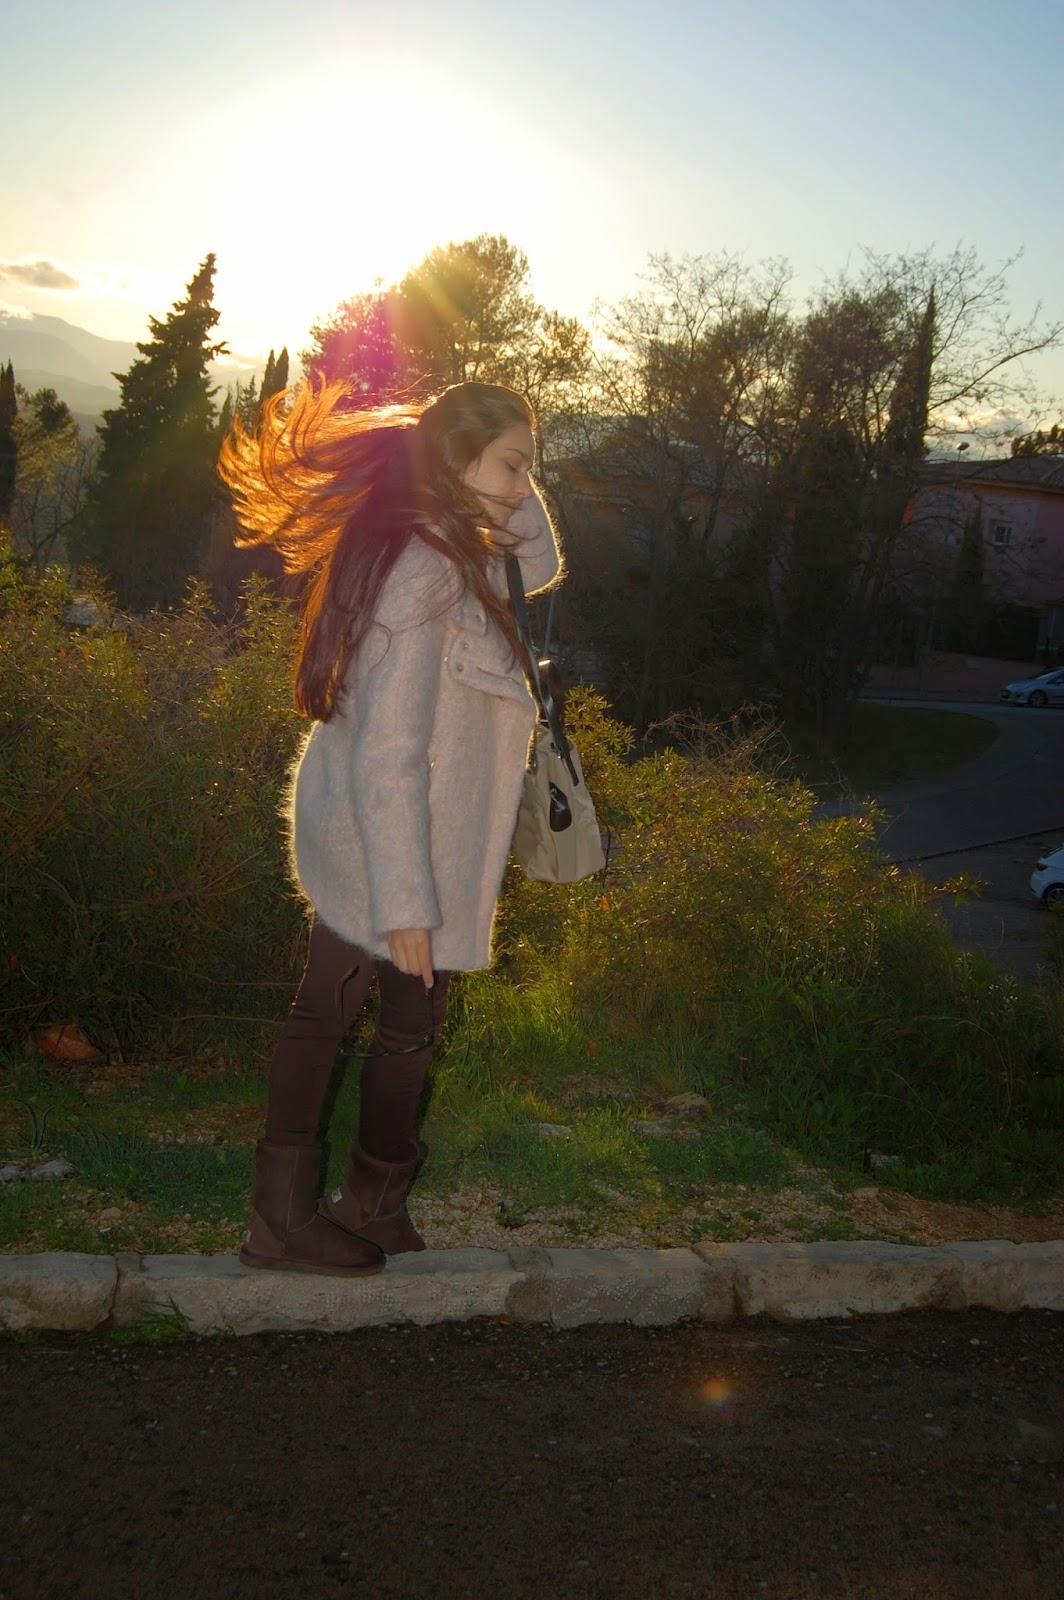 abrigo zara rosa, jersey cuello vuelto zara, pantalones marrones zara, botas ugg marrones, bolso bimba&lola beige, gafas de sol ray-ban erika